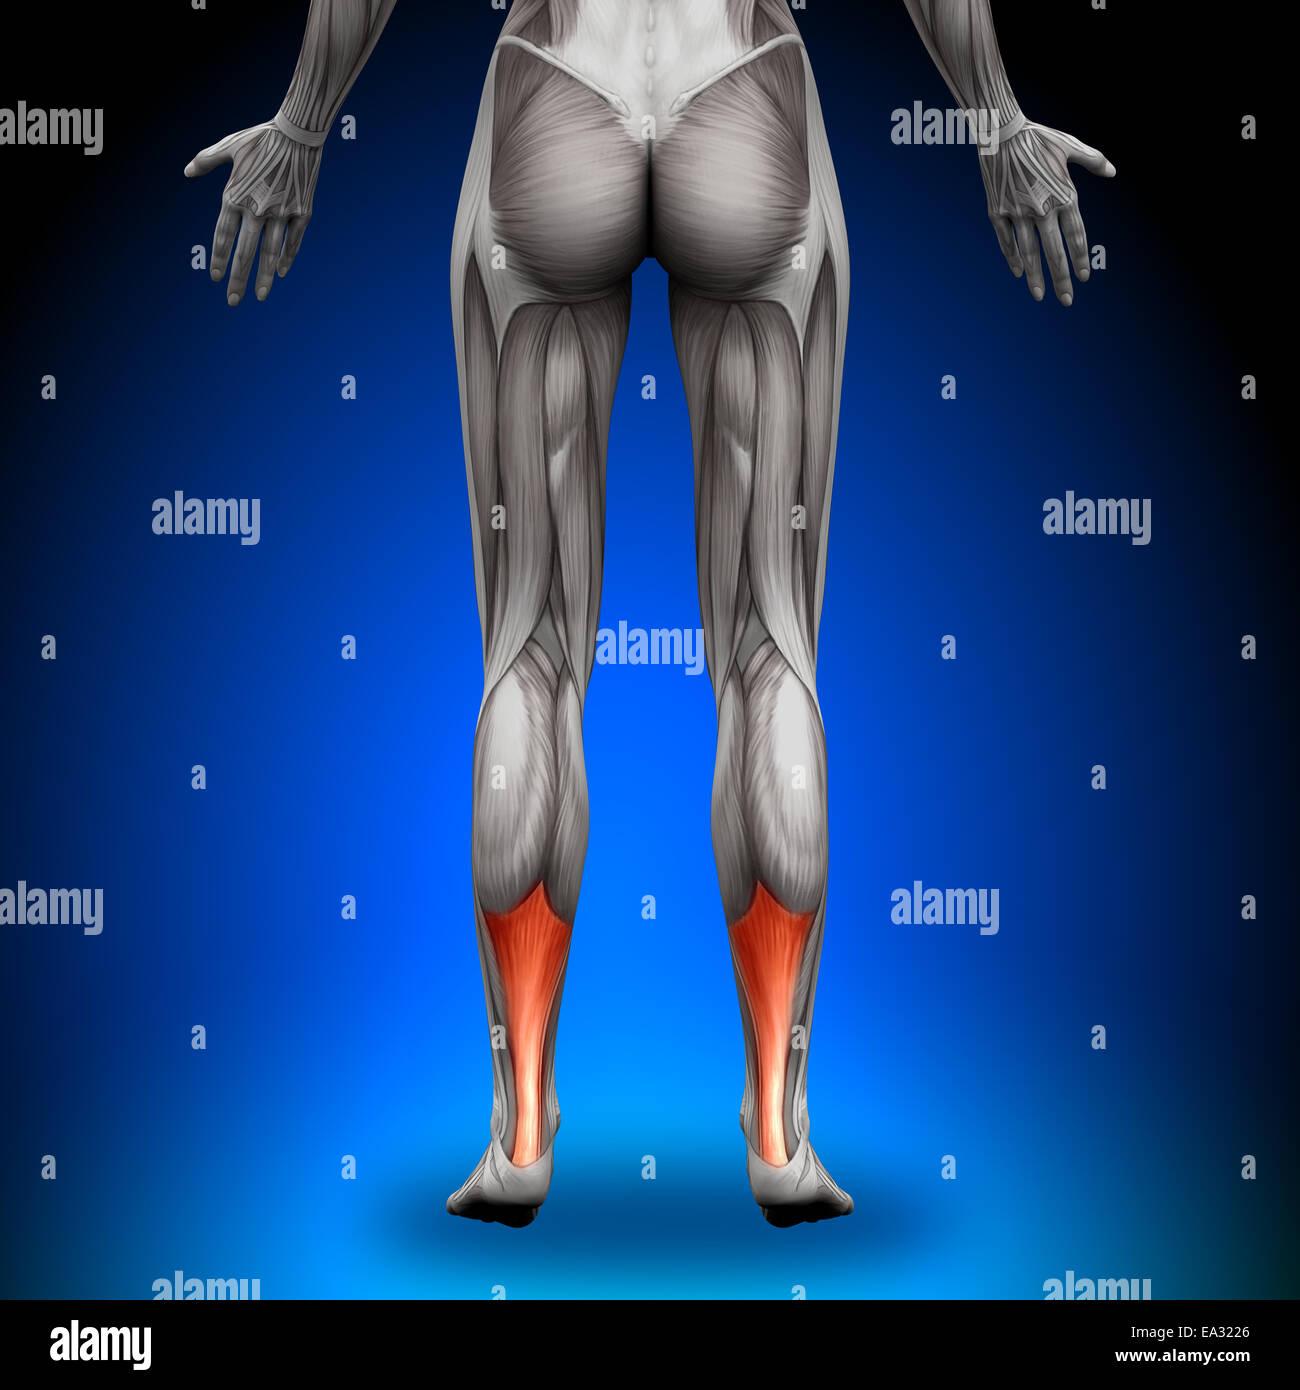 Achilles Tendon - Male Anatomy Muscles Stock Photo: 75055518 - Alamy